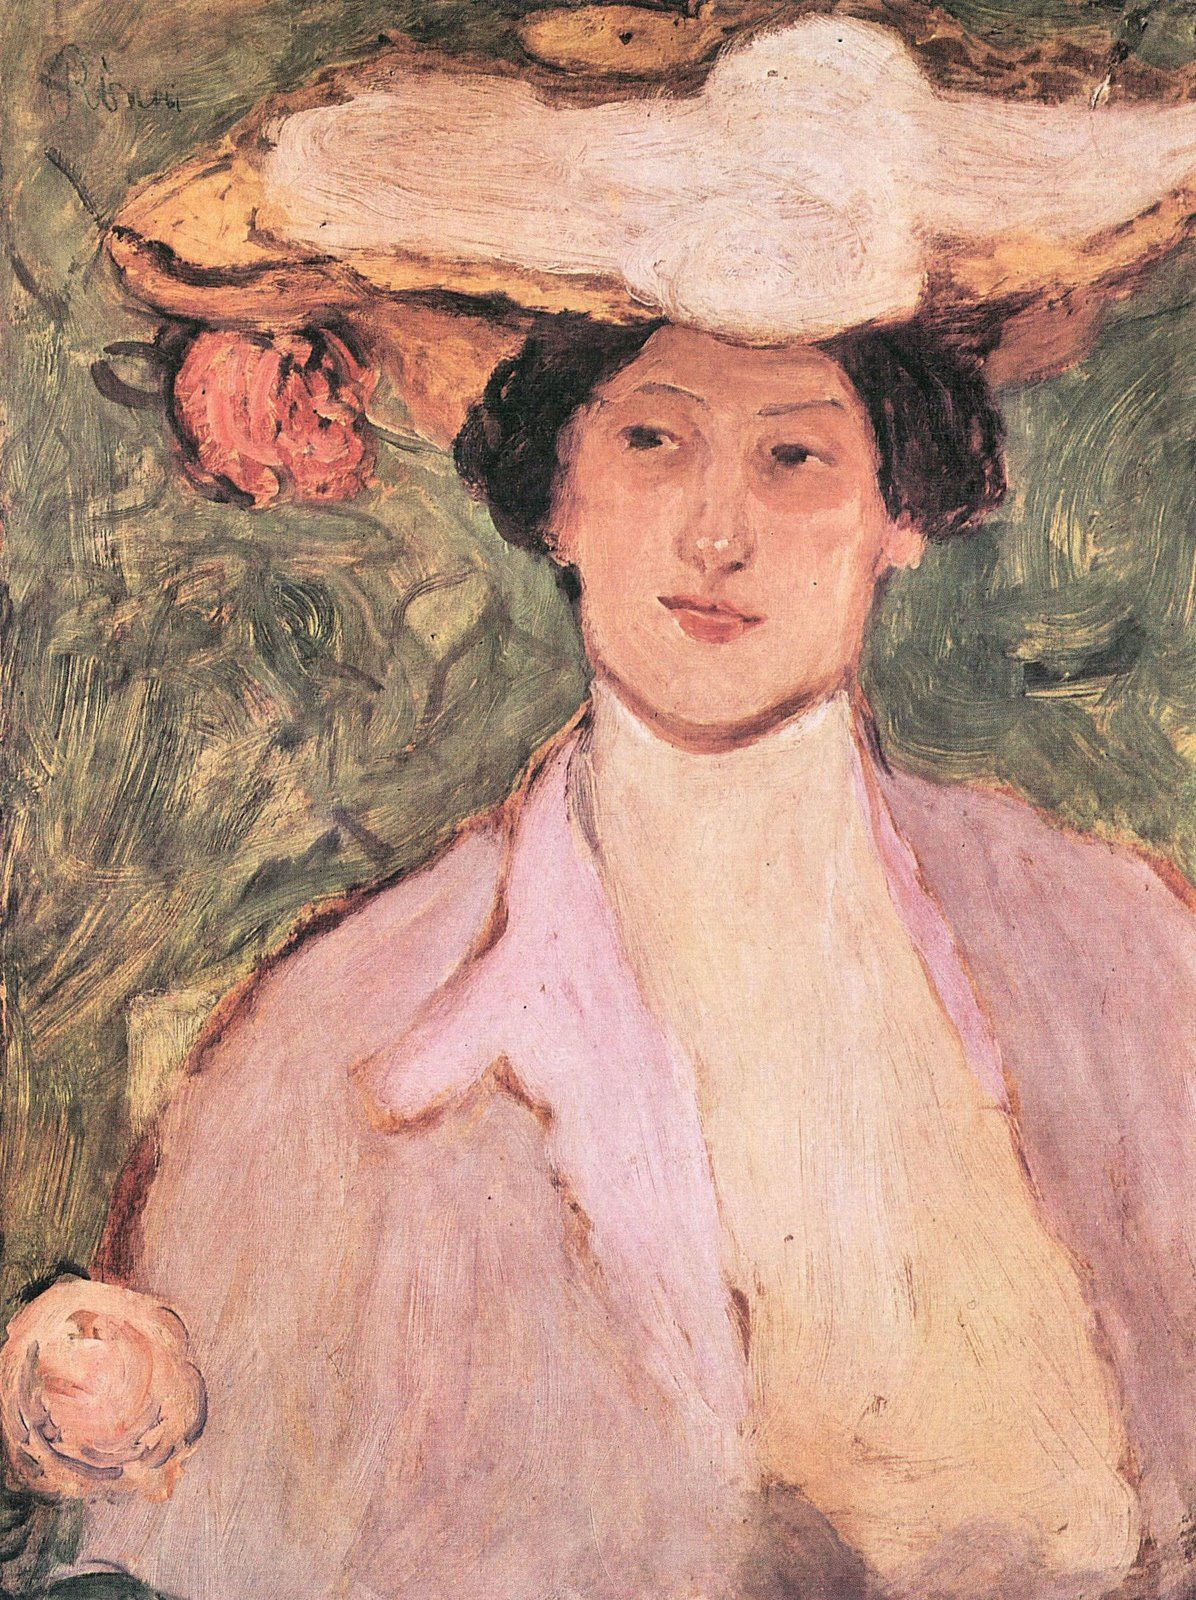 Women In Painting By Jozsef Rippl Ronai 1861 1927 Blog Of An Art Admirer Painting Art Portrait Art